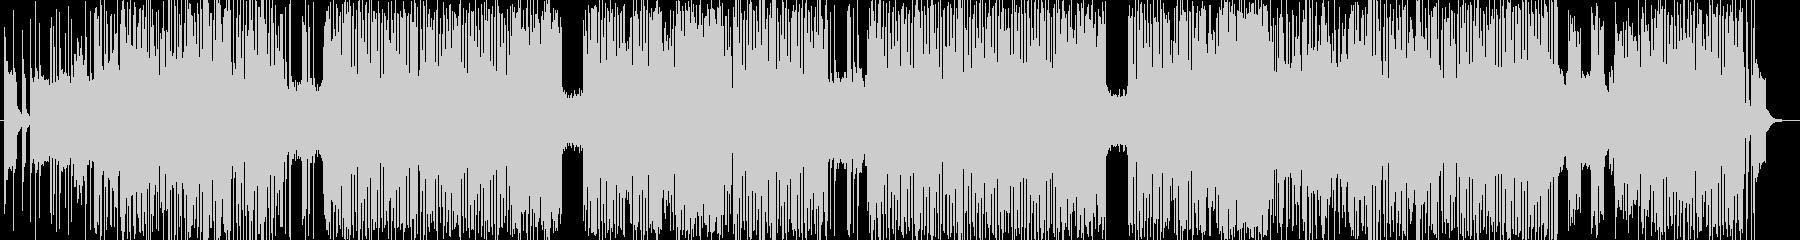 「HARDROCK・ダーク」BGM232の未再生の波形